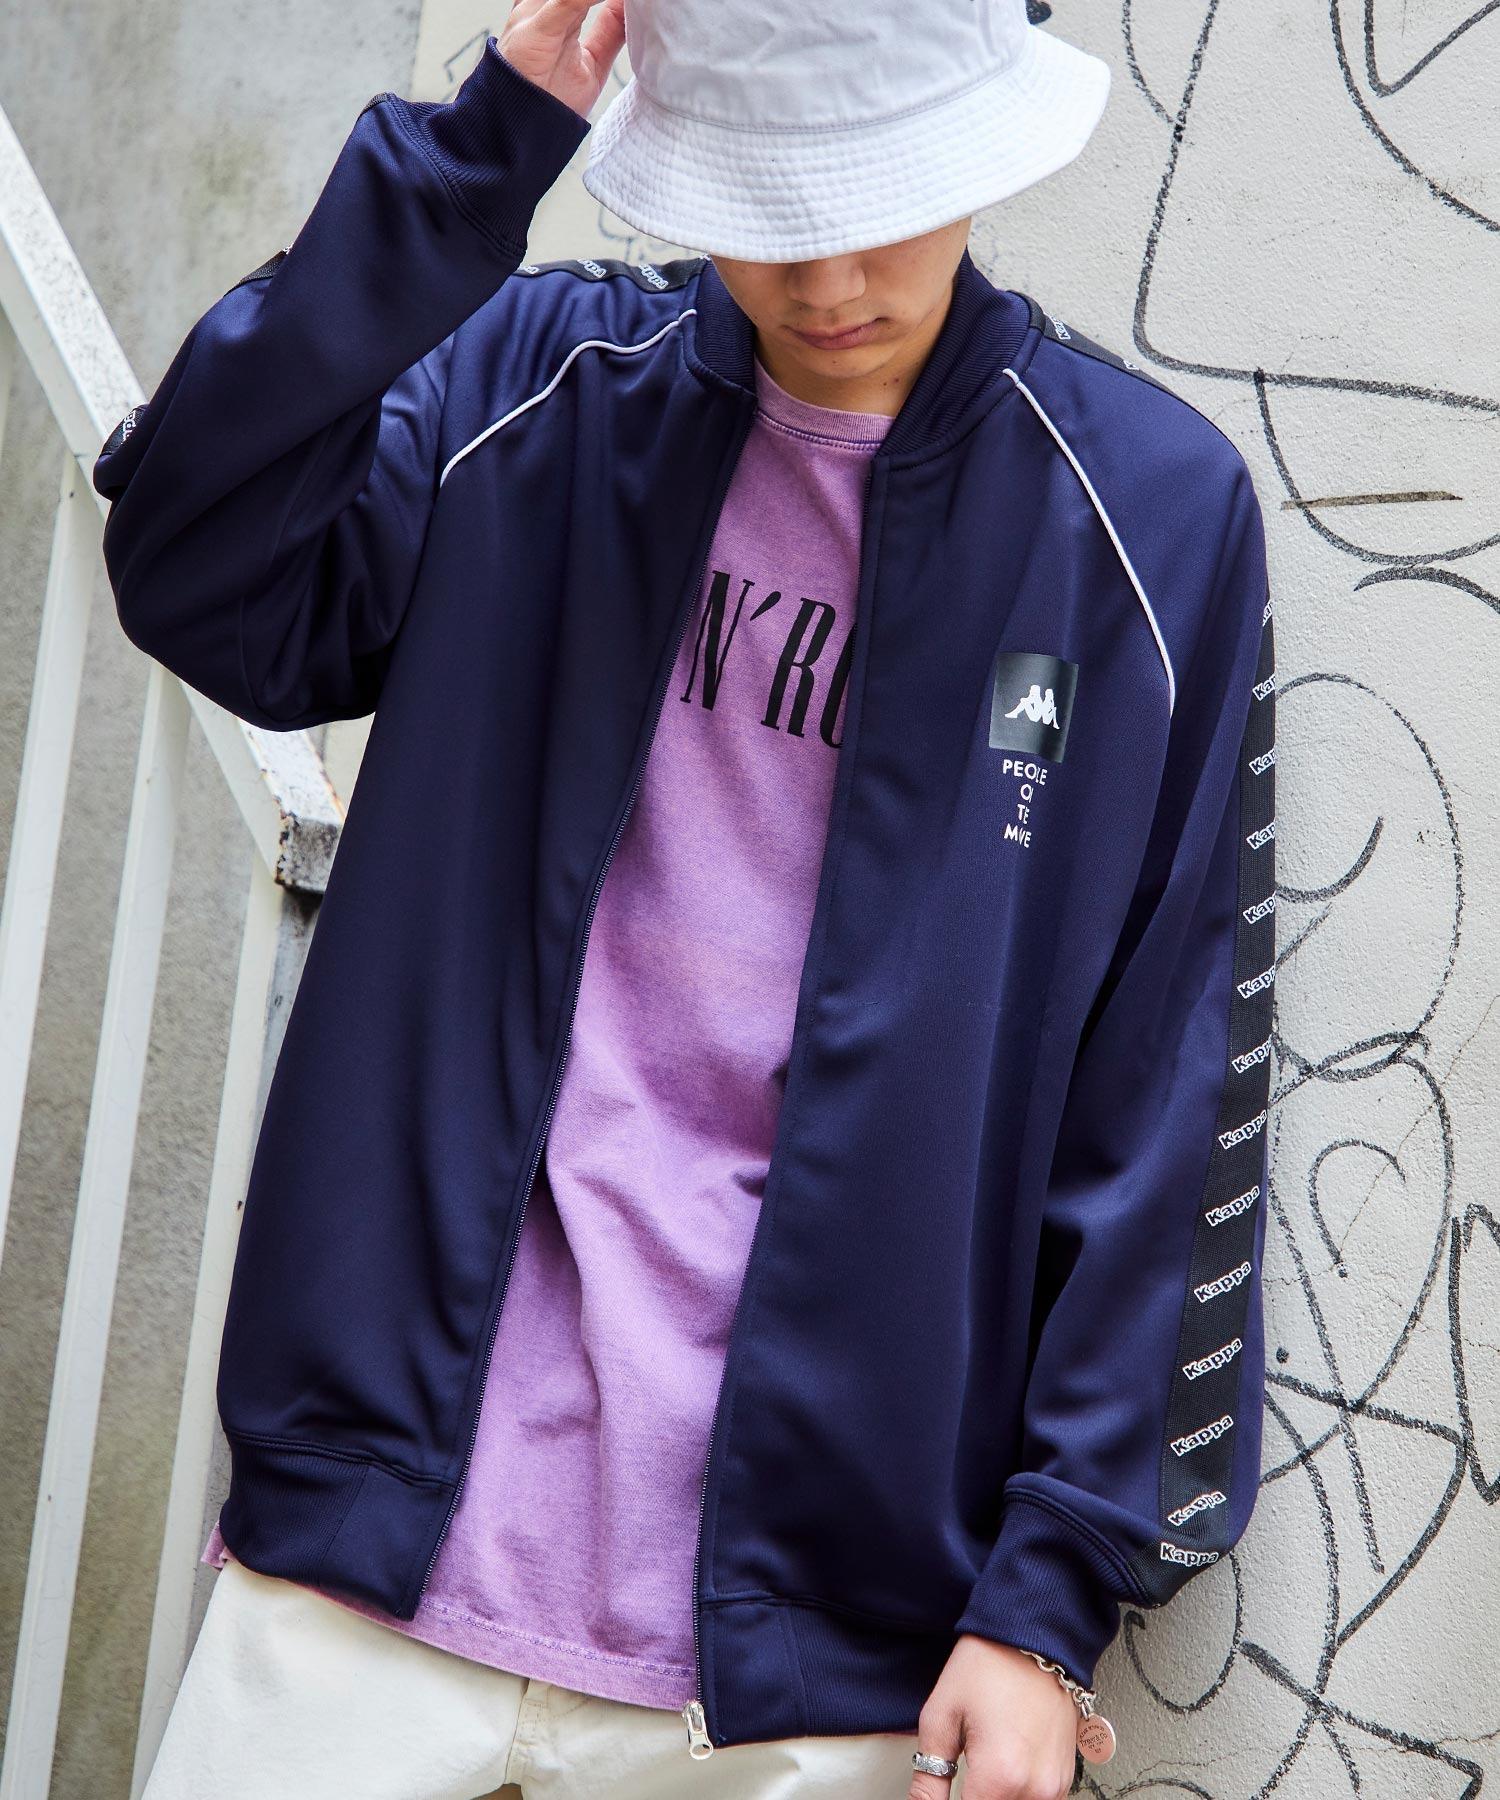 Kappa/カッパ 別注 袖サイドライントラックジャケット/ジャージ